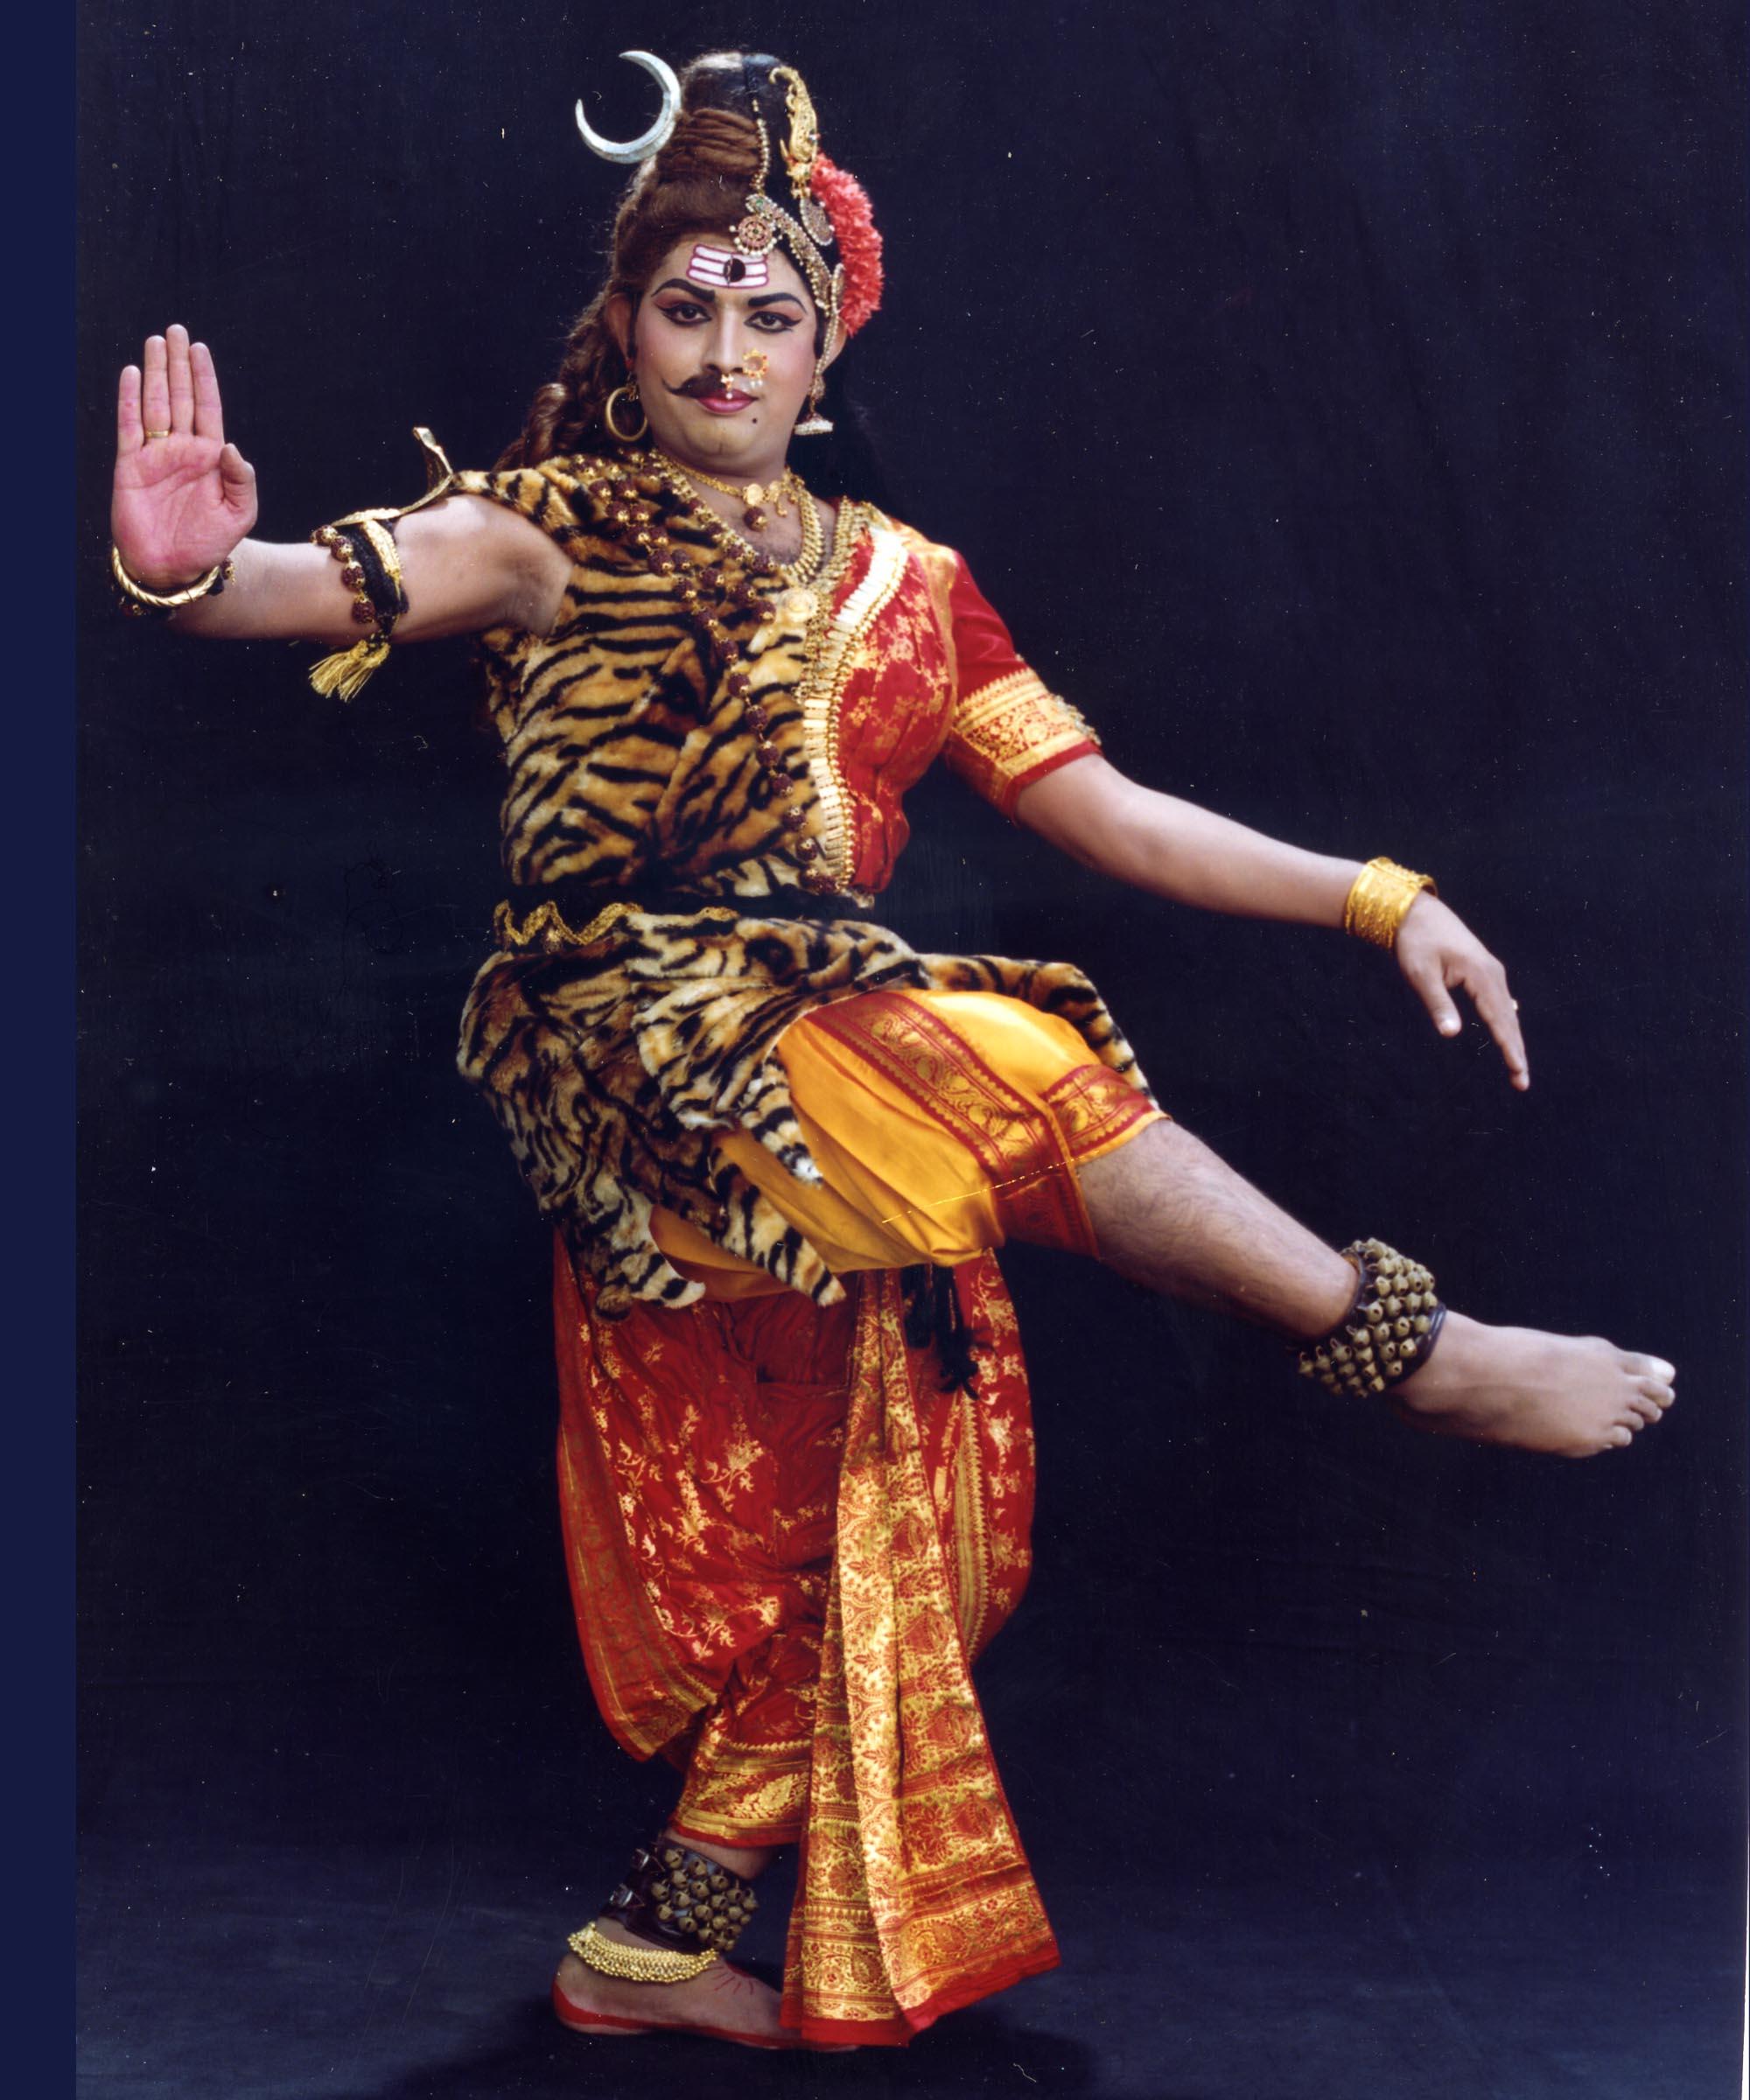 bharatanatyam poses - photo #49